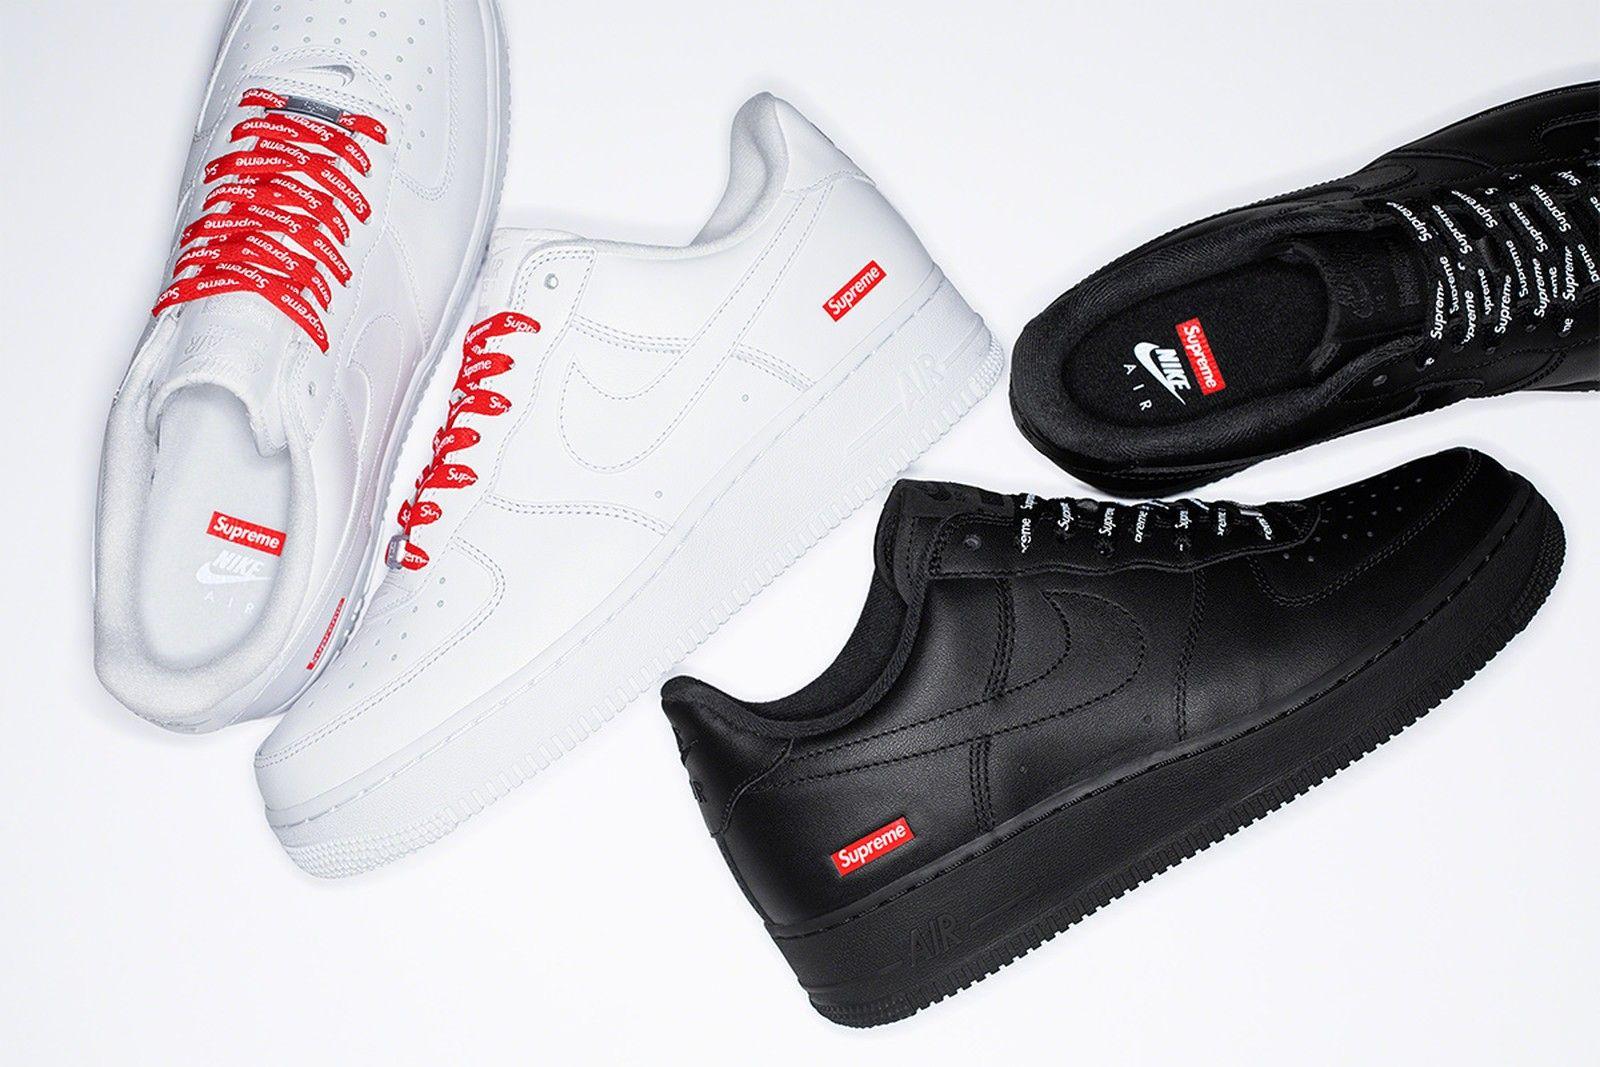 2020: Supreme x Nike Air Force 1 Low